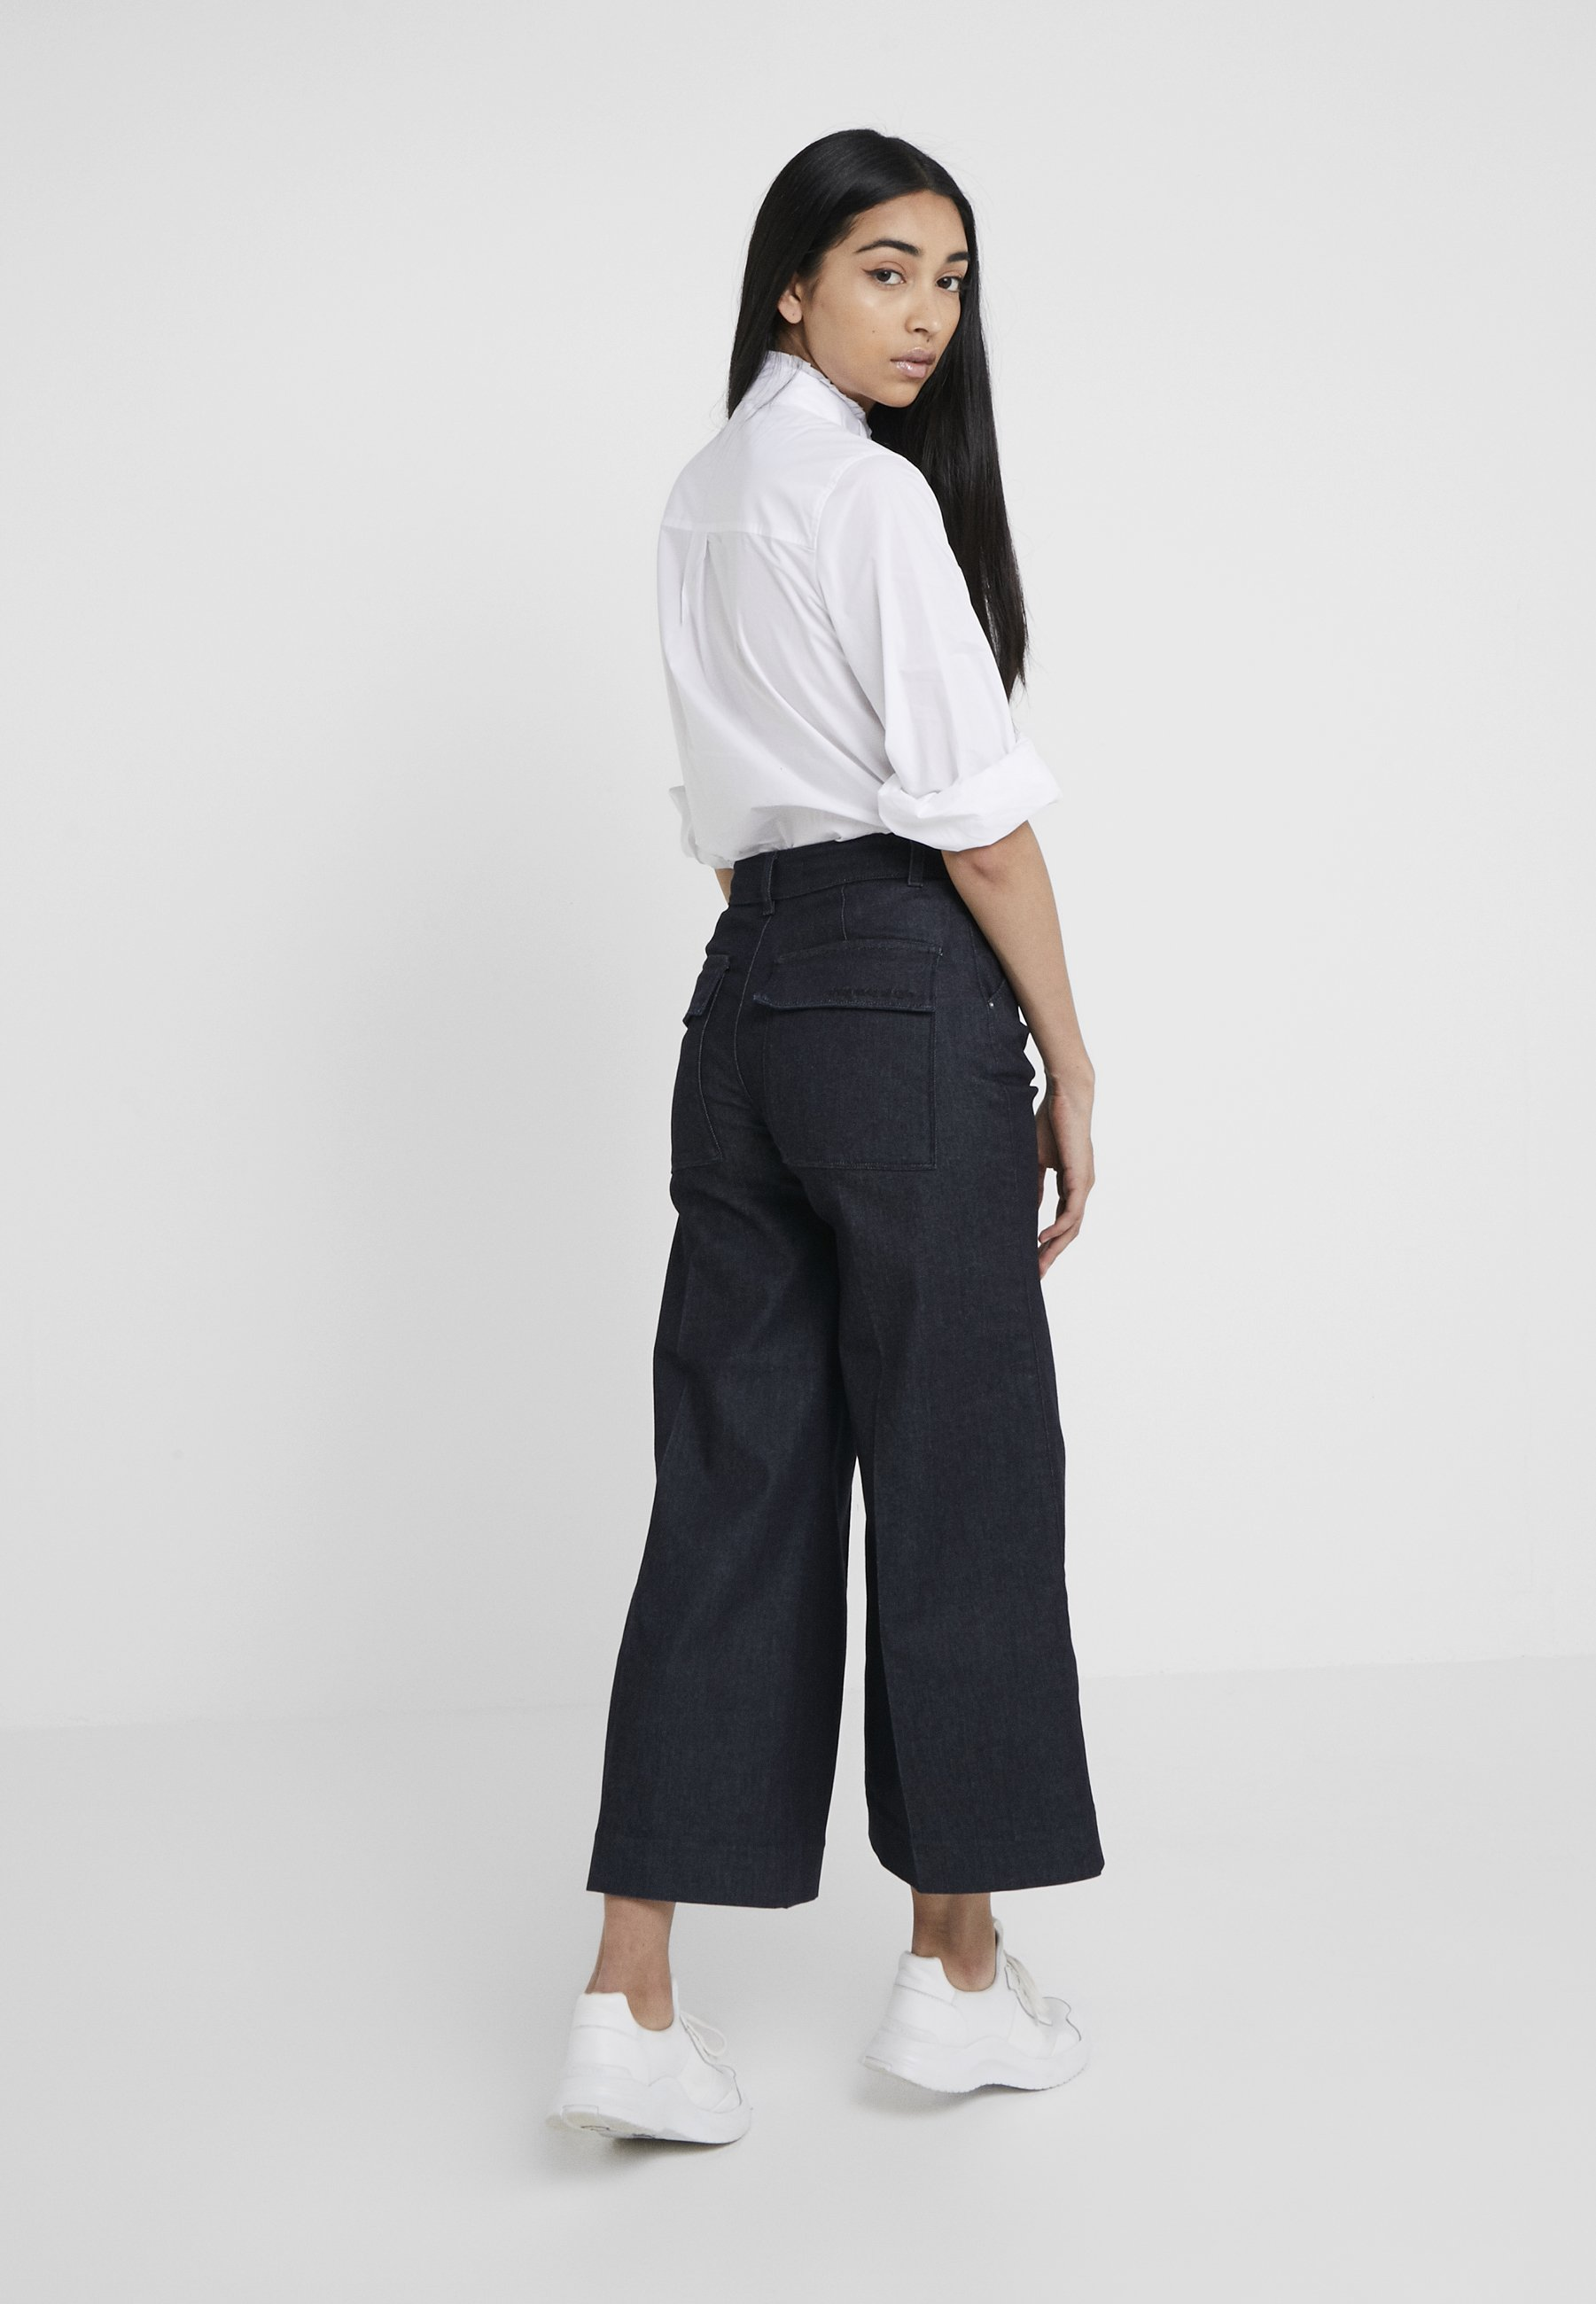 CulottesJean Blue Denim Flare Tailored Karl Lagerfeld 8vN0wmn